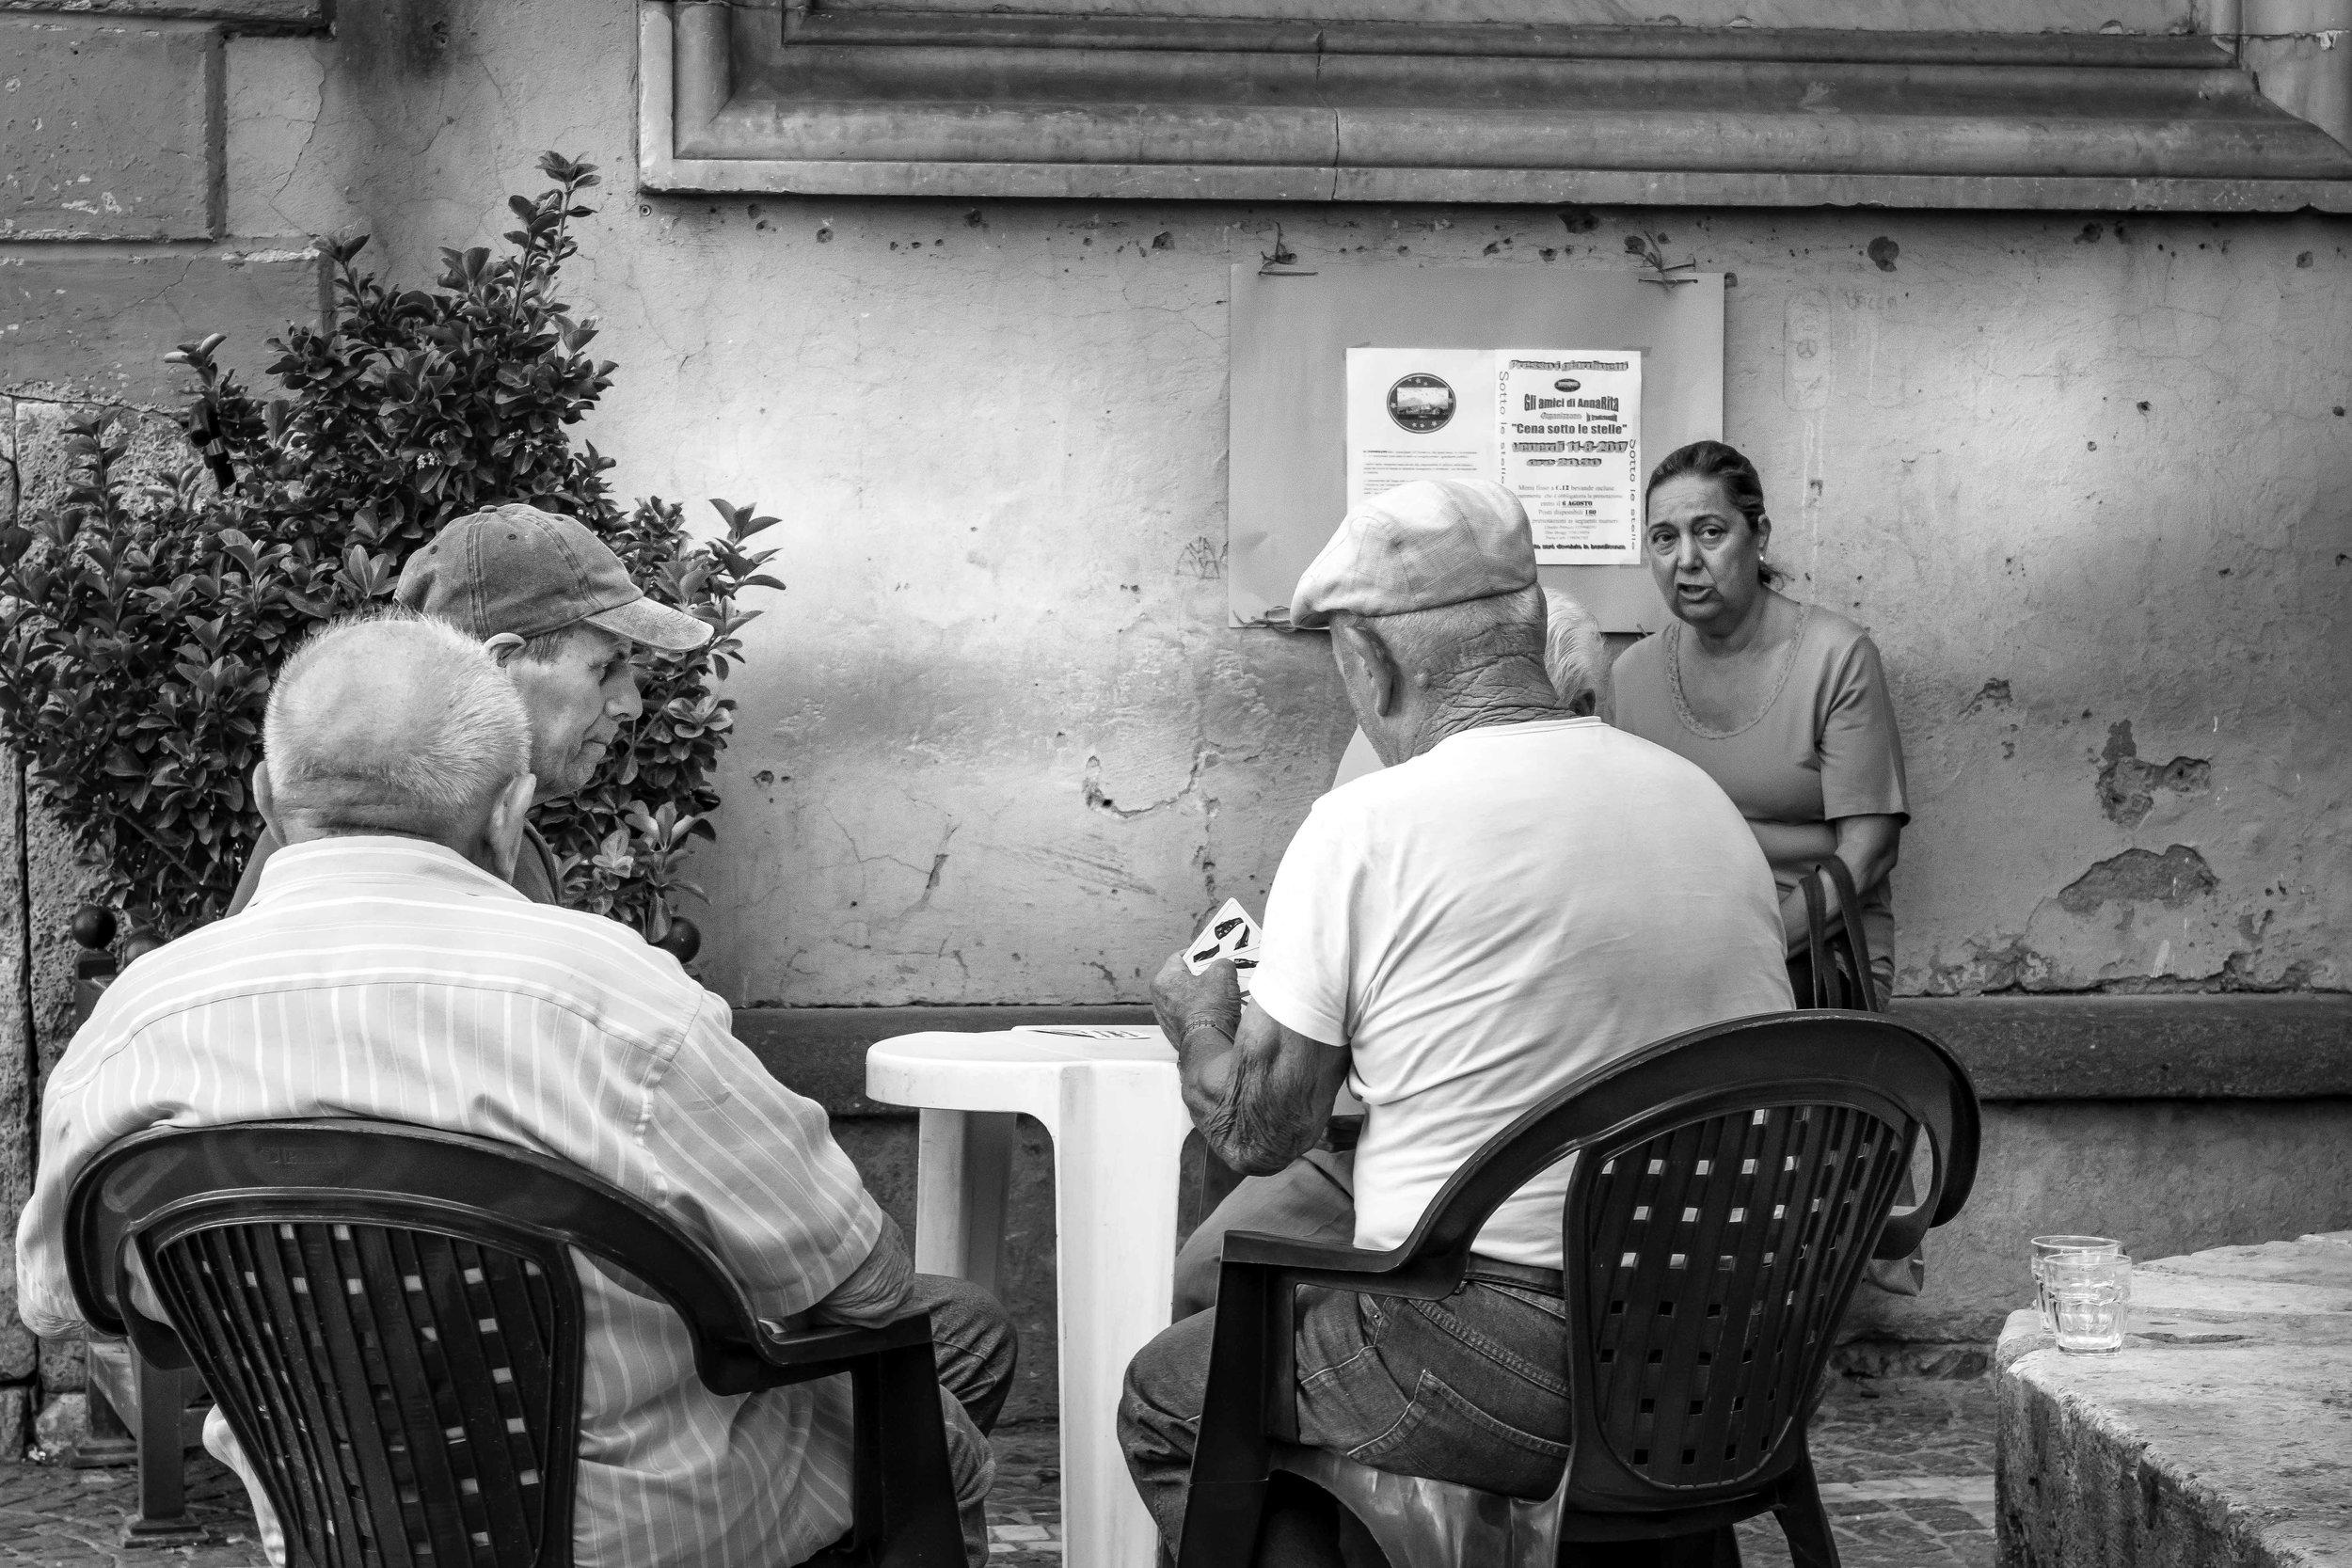 viewfinder-straatfotografie-oude-mannen-in-Collevecchio-11.jpg